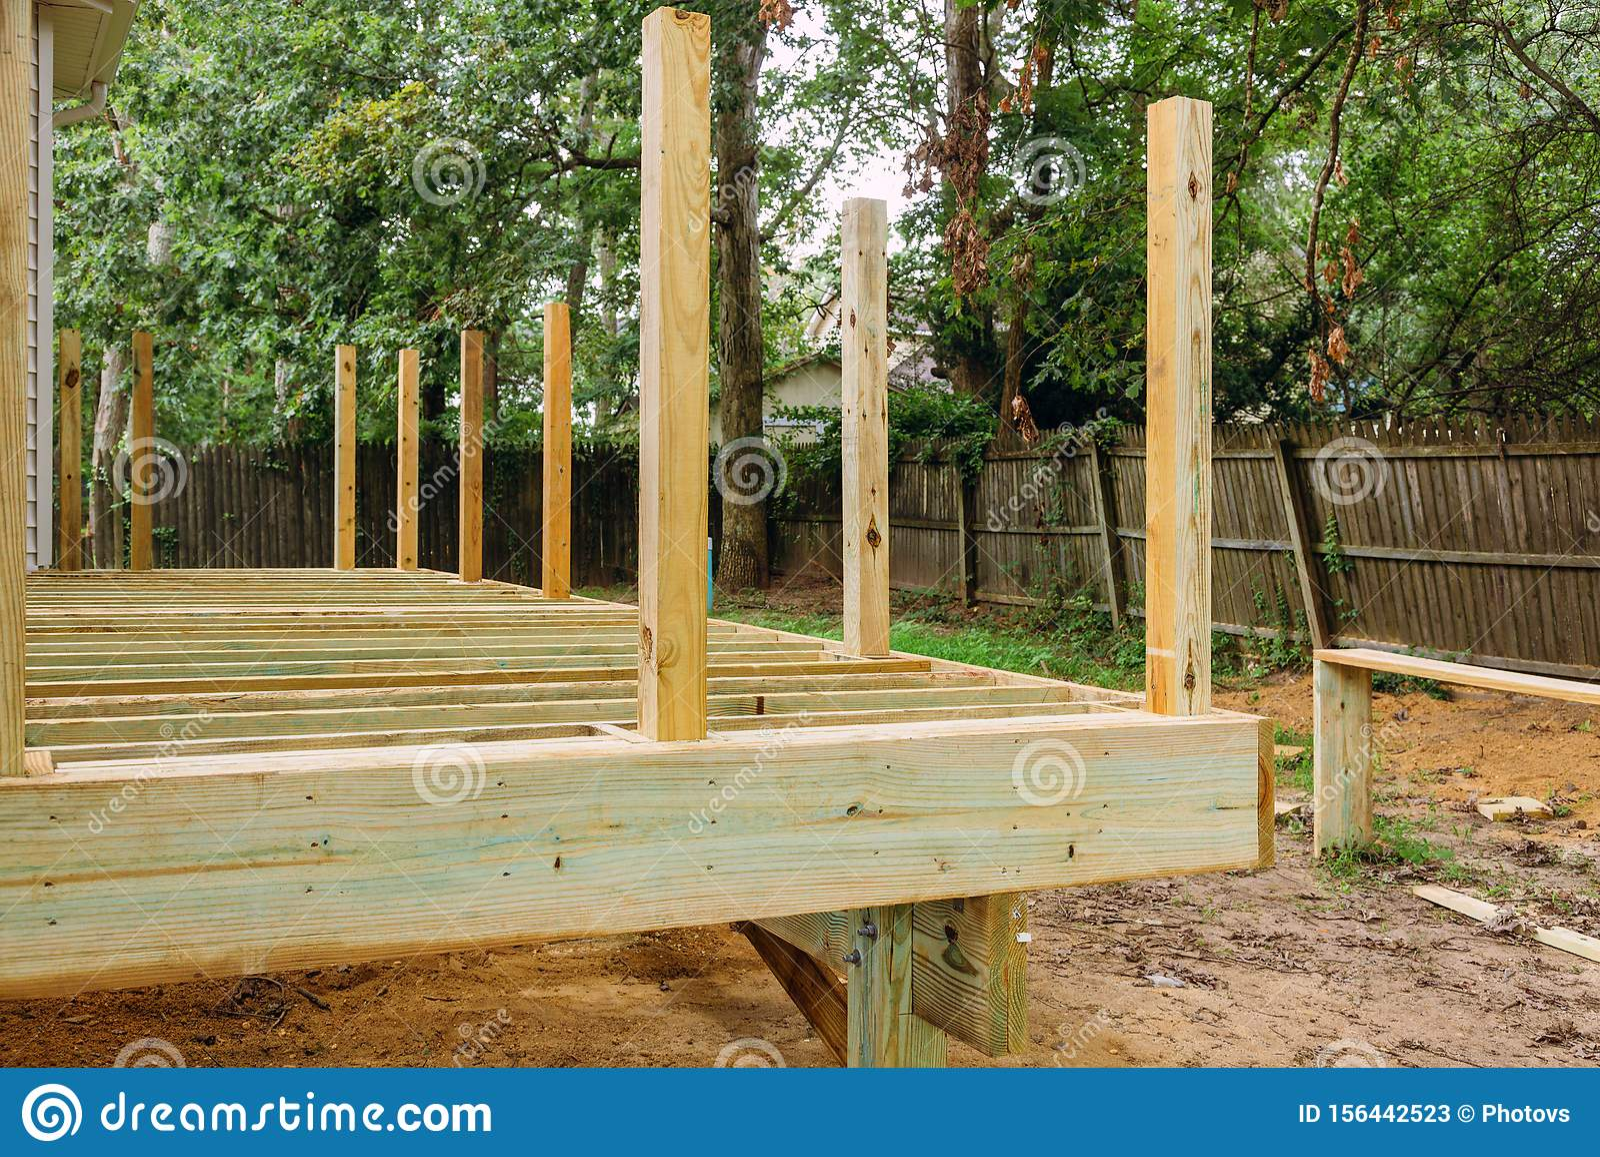 https www dreamstime com installing wood floor patio deck new wooden decking fragment planks installing wood floor patio deck new wooden image156442523